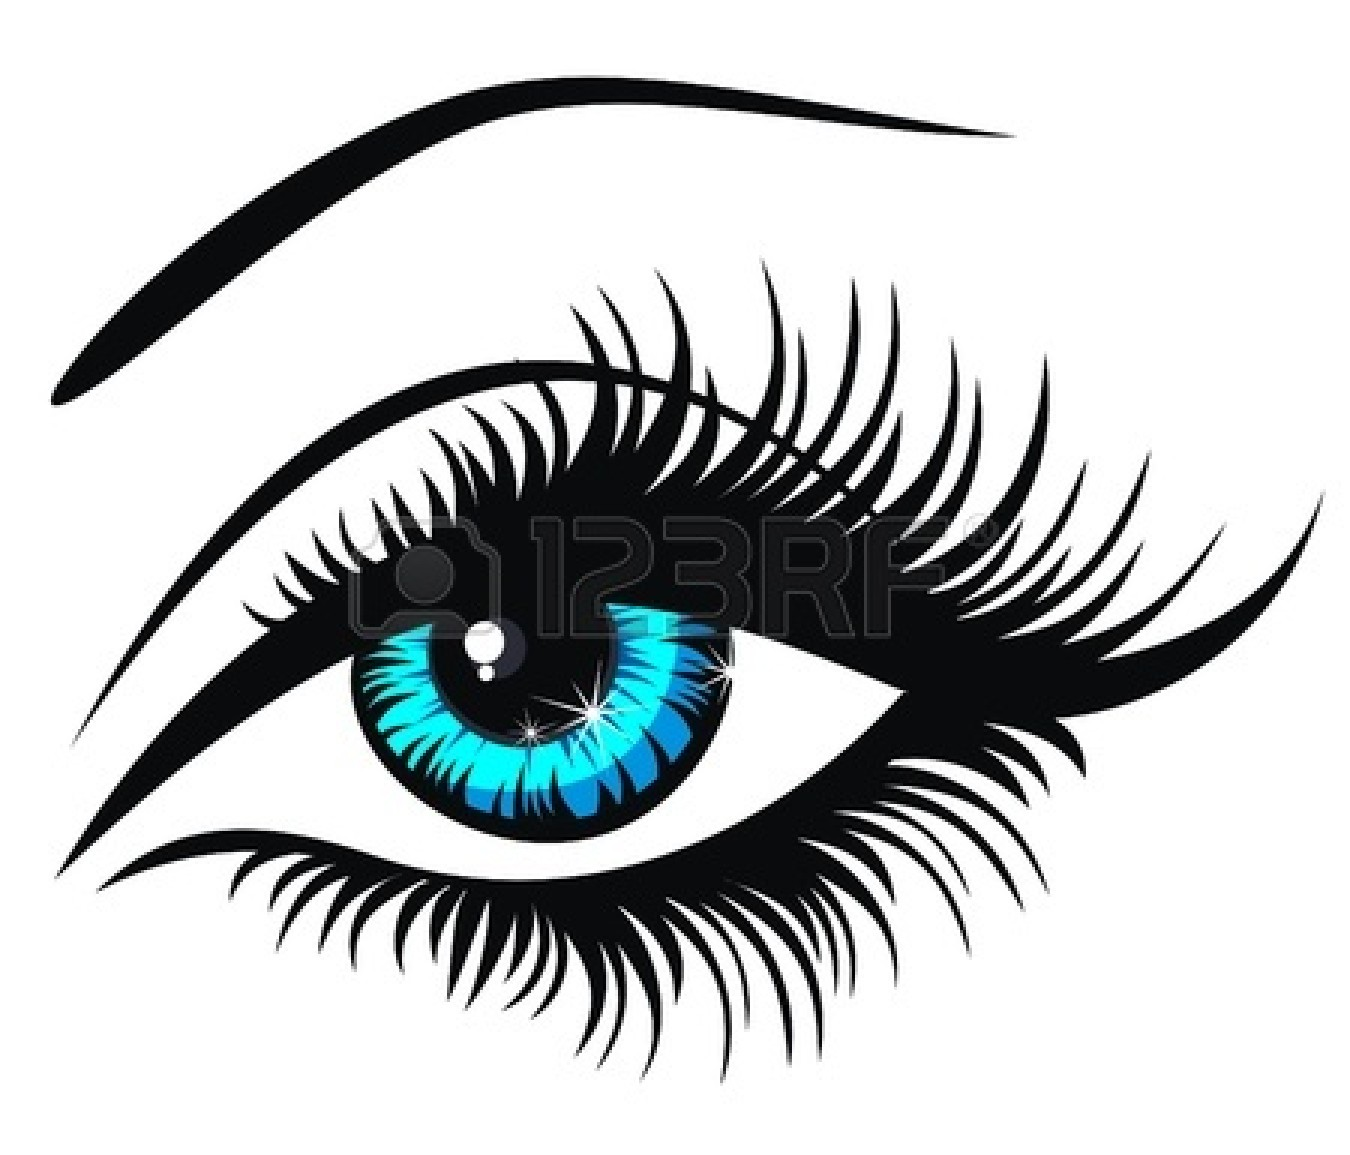 1350x1155 Eyes Cartoon Eye Clip Art Clipart Image 0 4